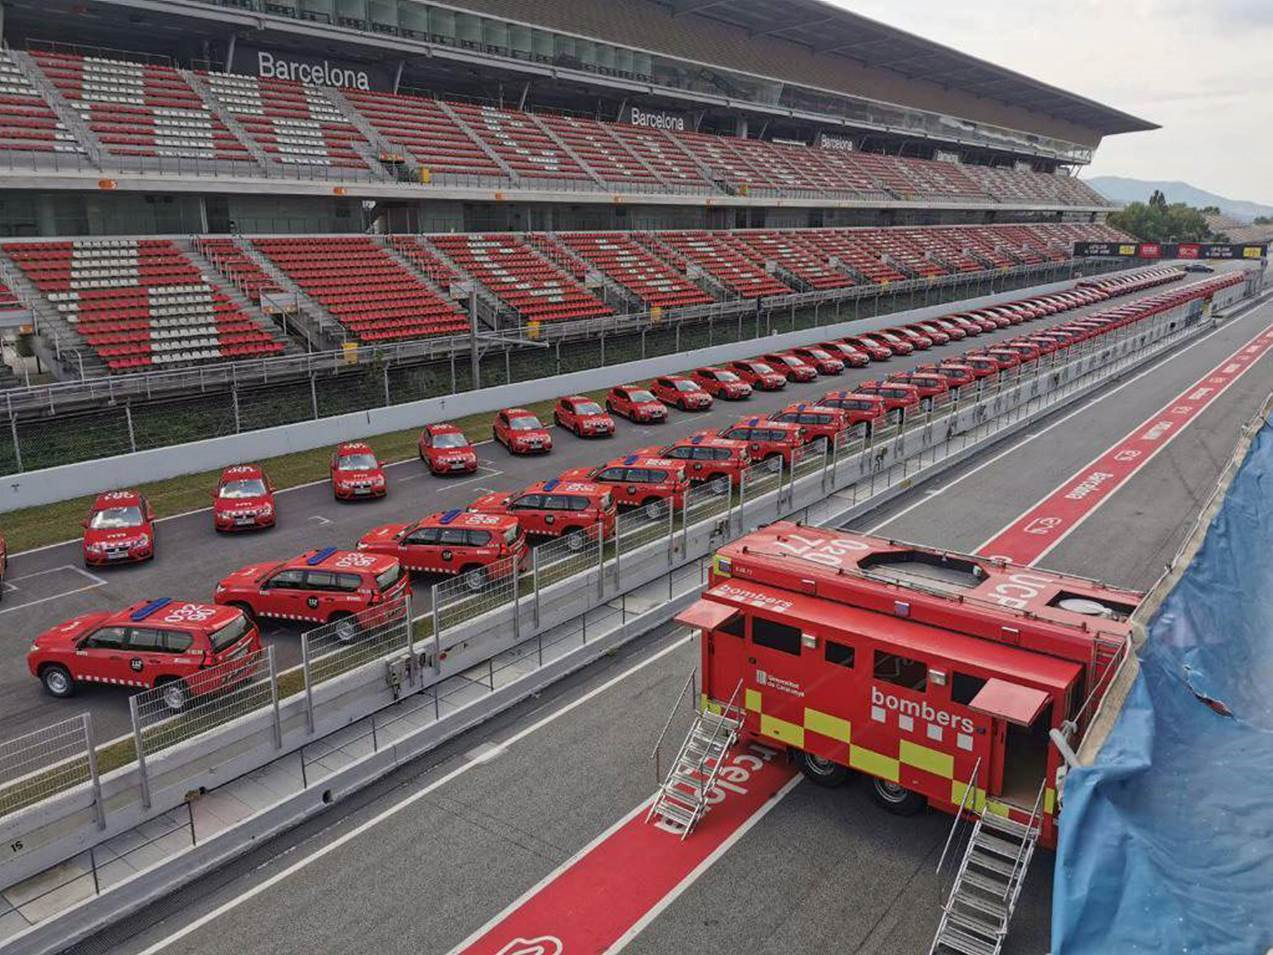 Los Bomberos de la Generalitat reciben 58 Toyota Land Cruiser GX de la mano de Vallescar Empresas y Toyota Ippon Motor Vallès.